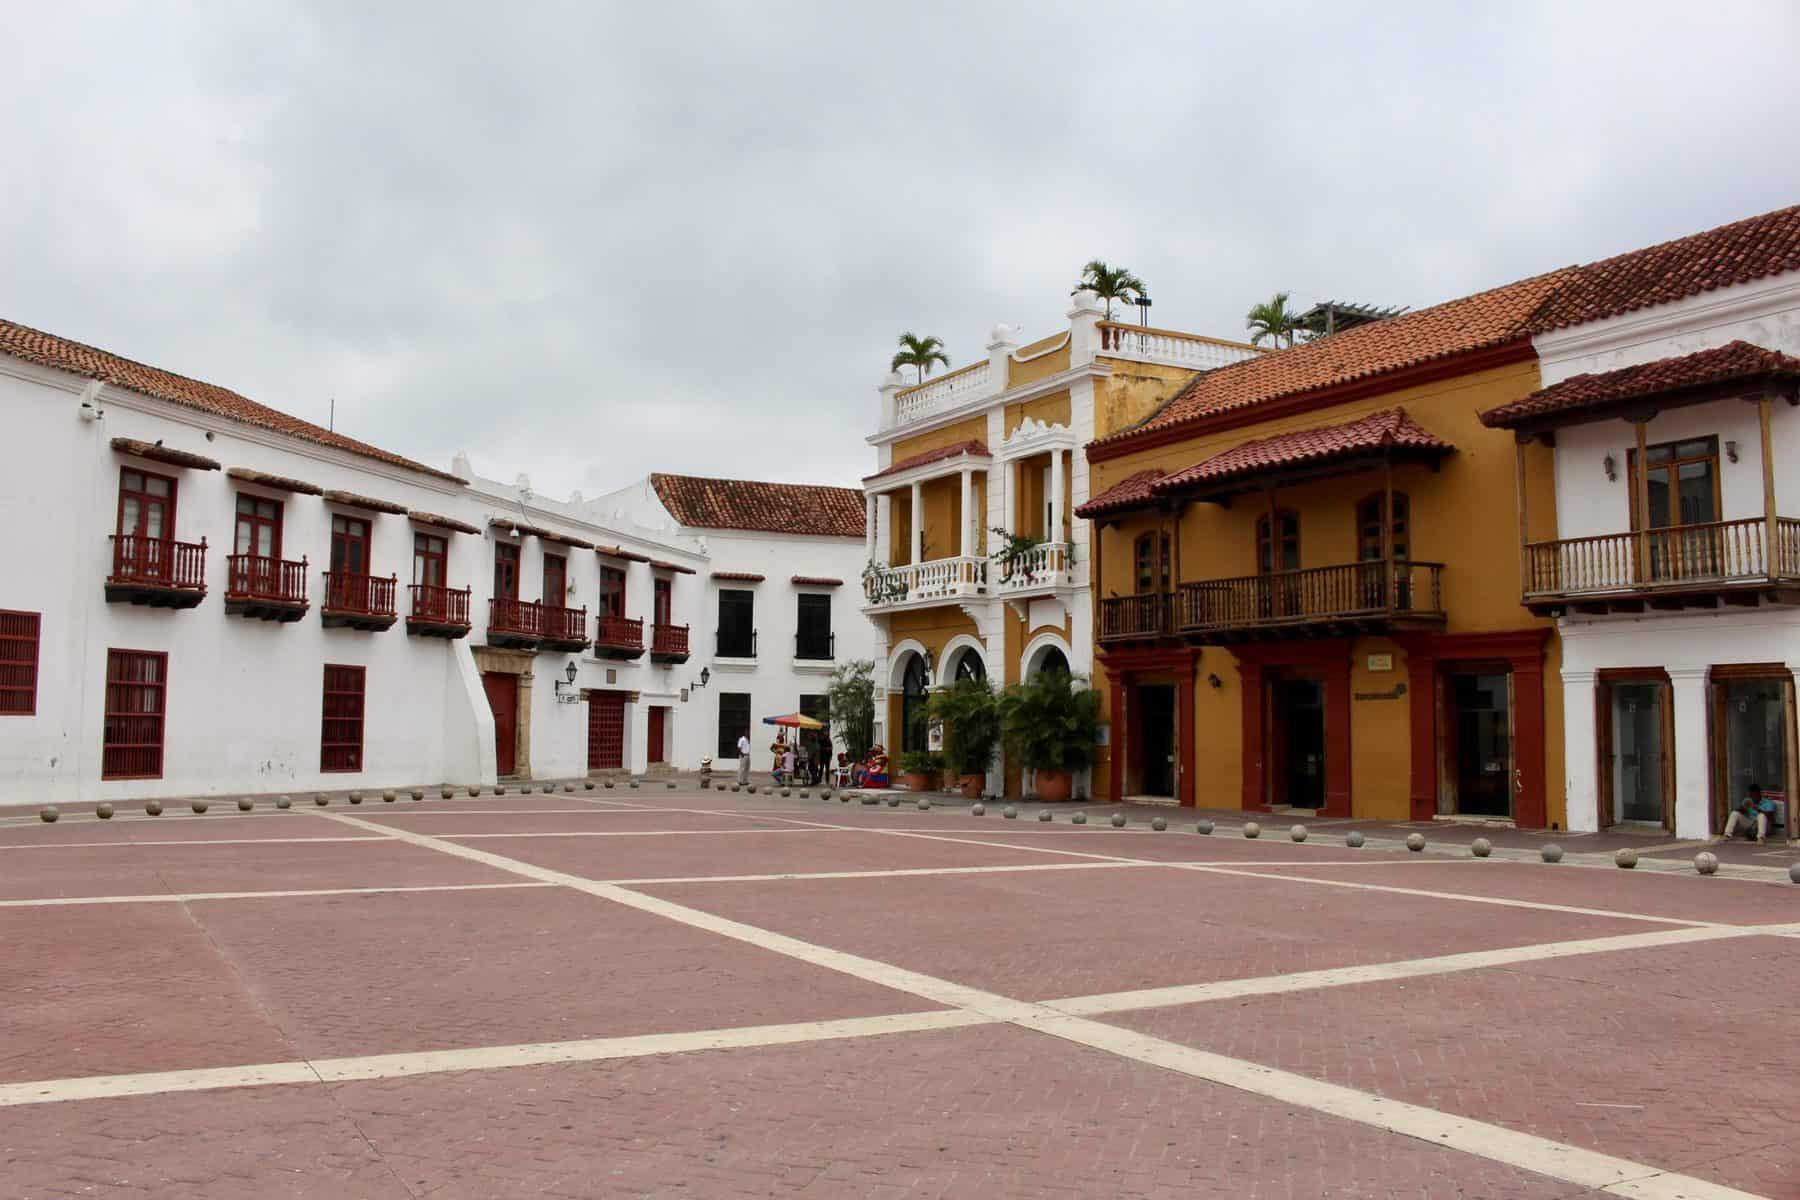 Cartagena Colombia 10 Day Itinerary